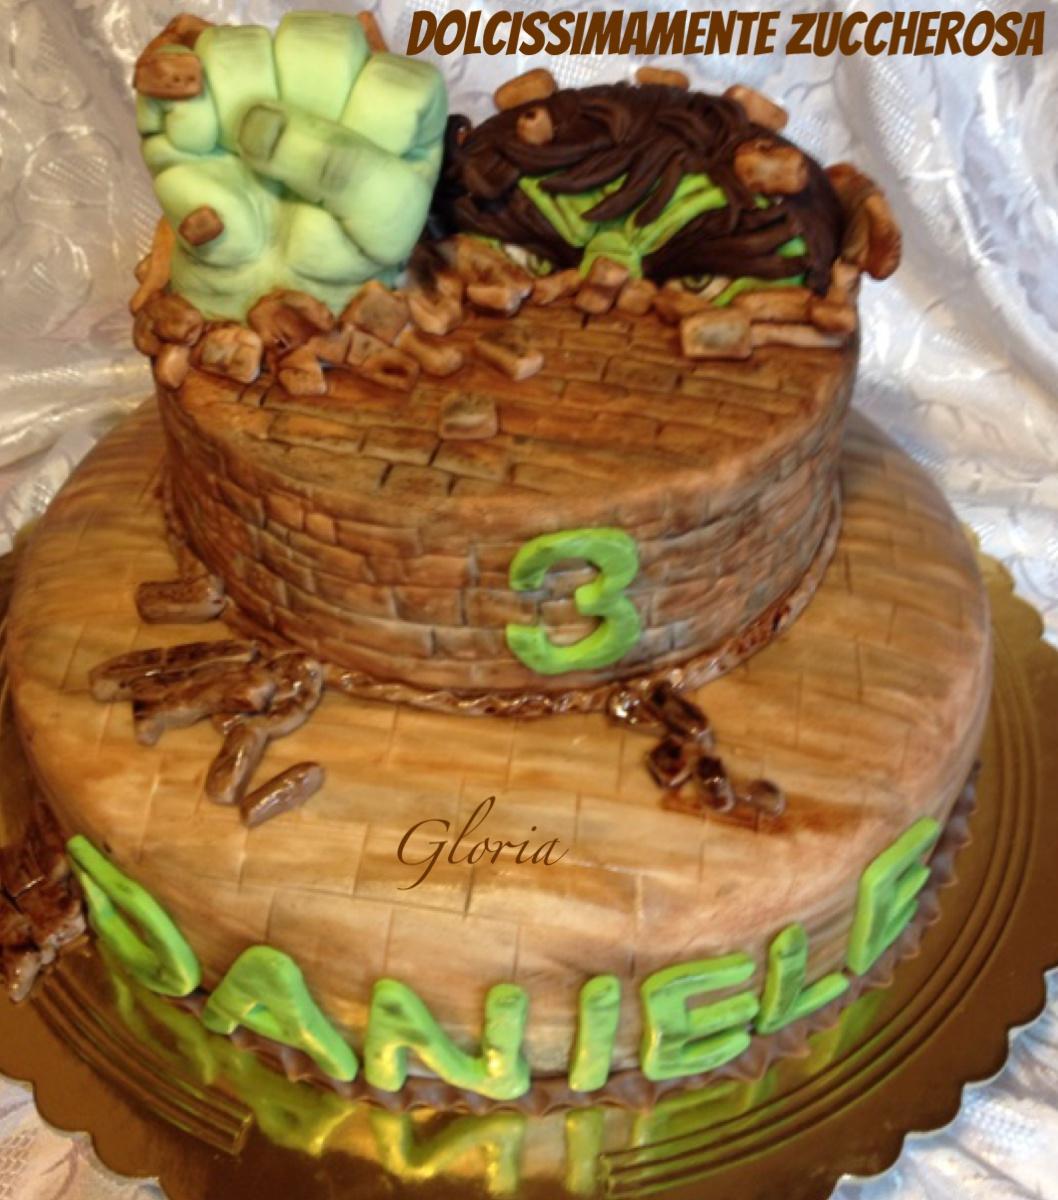 Torta Hulk pugno in pasta di zucchero pdz